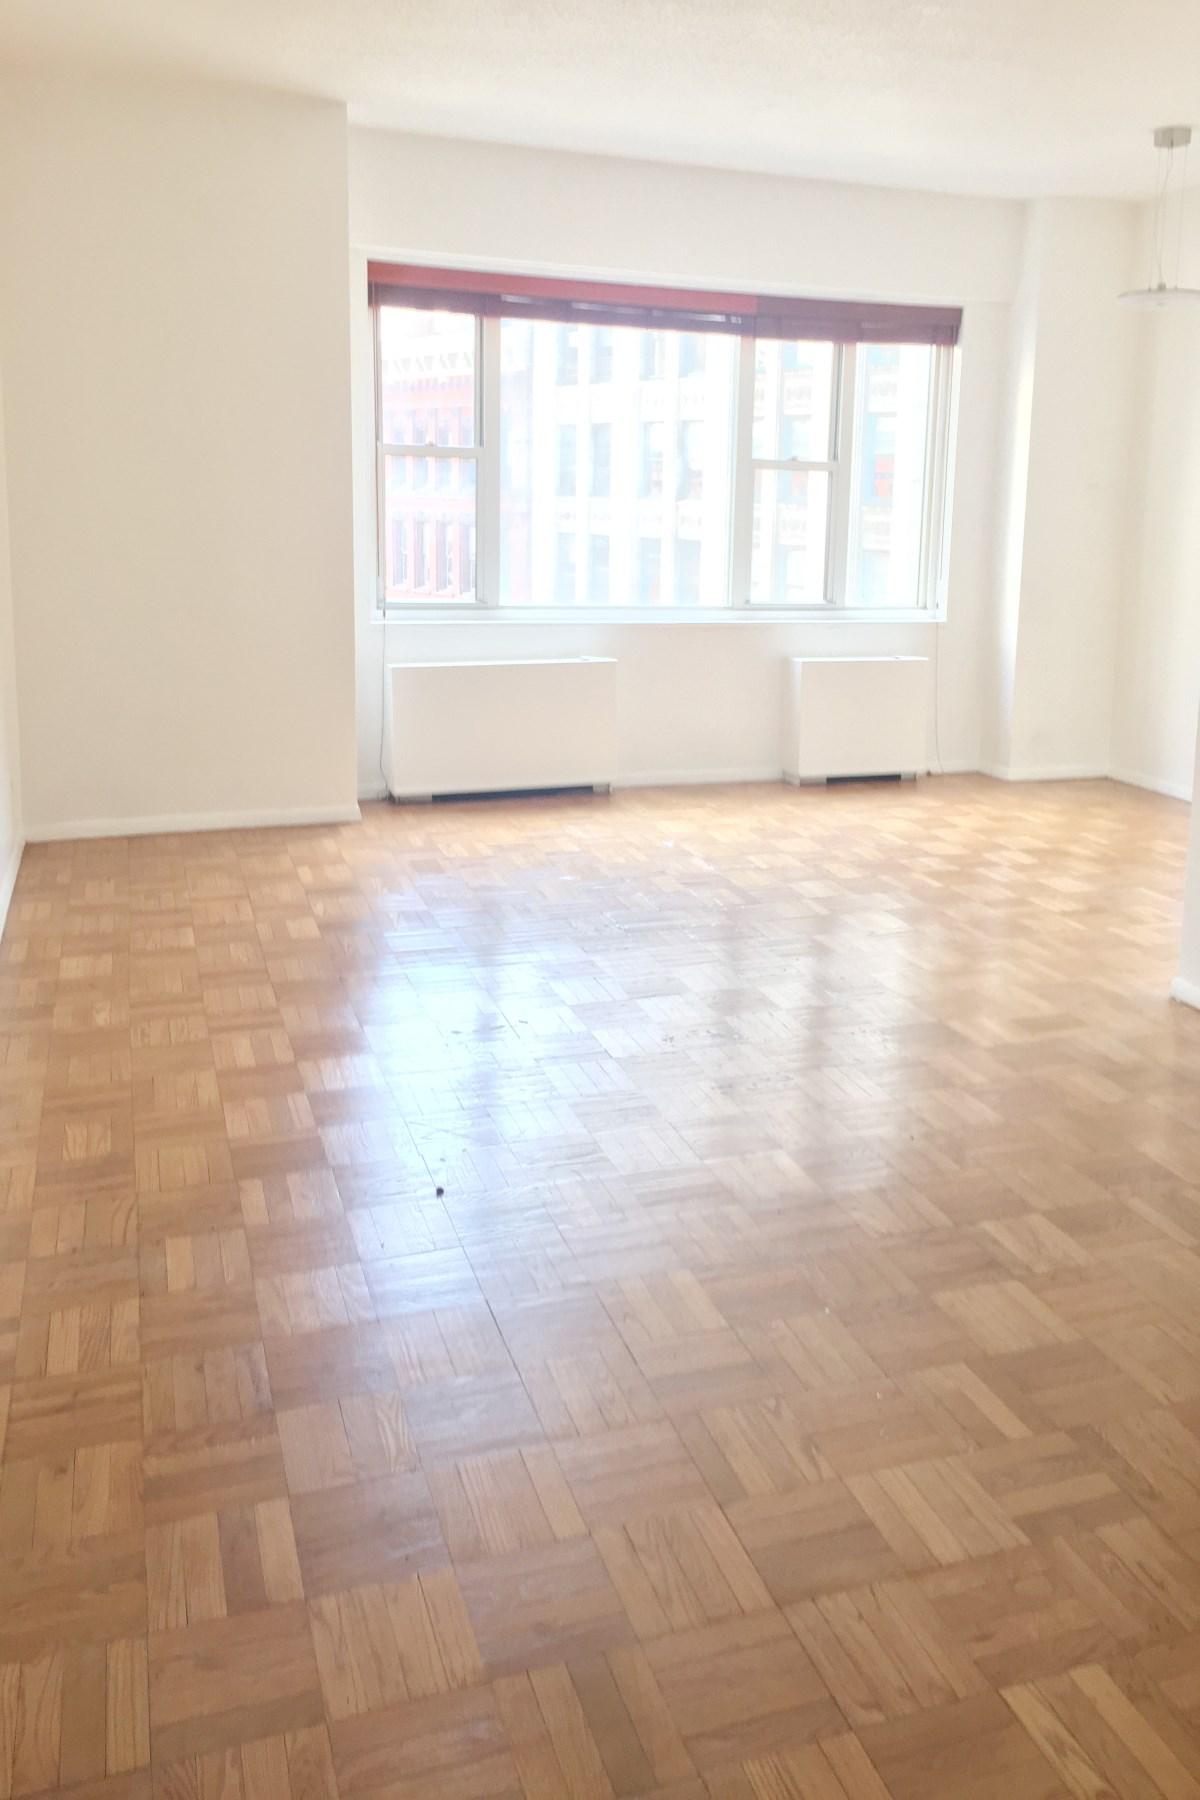 合作公寓 为 销售 在 Greenwich Village condop for Investors 60 East 8th Street Apt 9N 纽约, 纽约州, 10003 美国